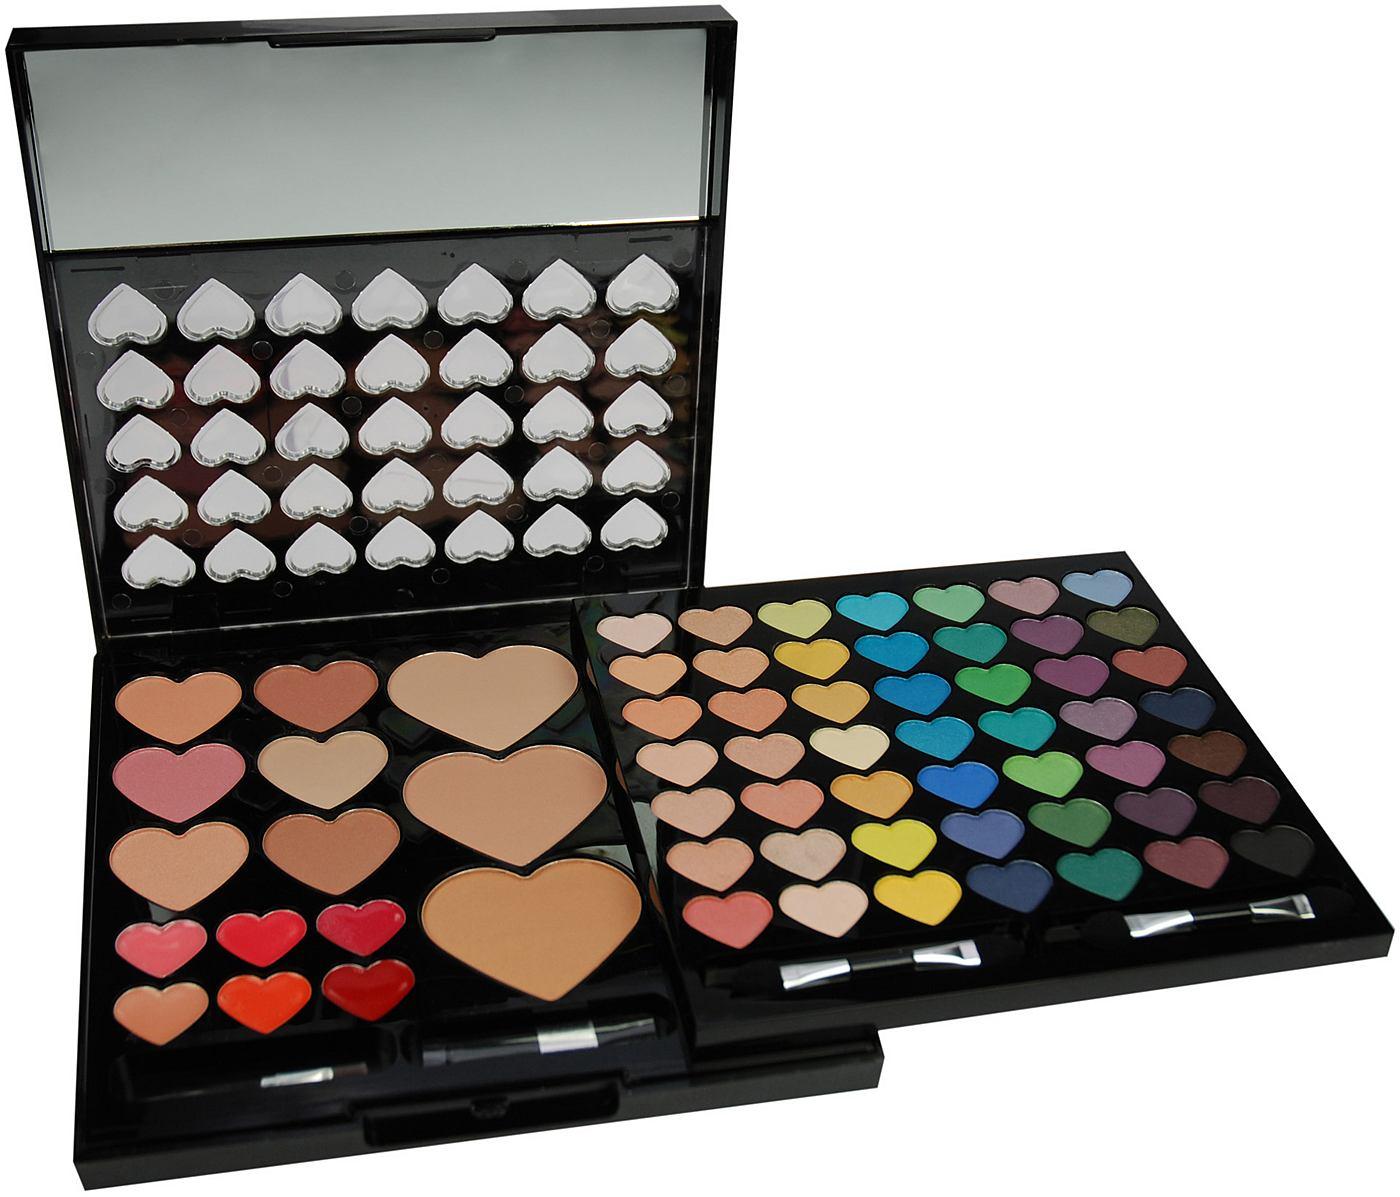 Make-upcase Heart Compact 64-delig